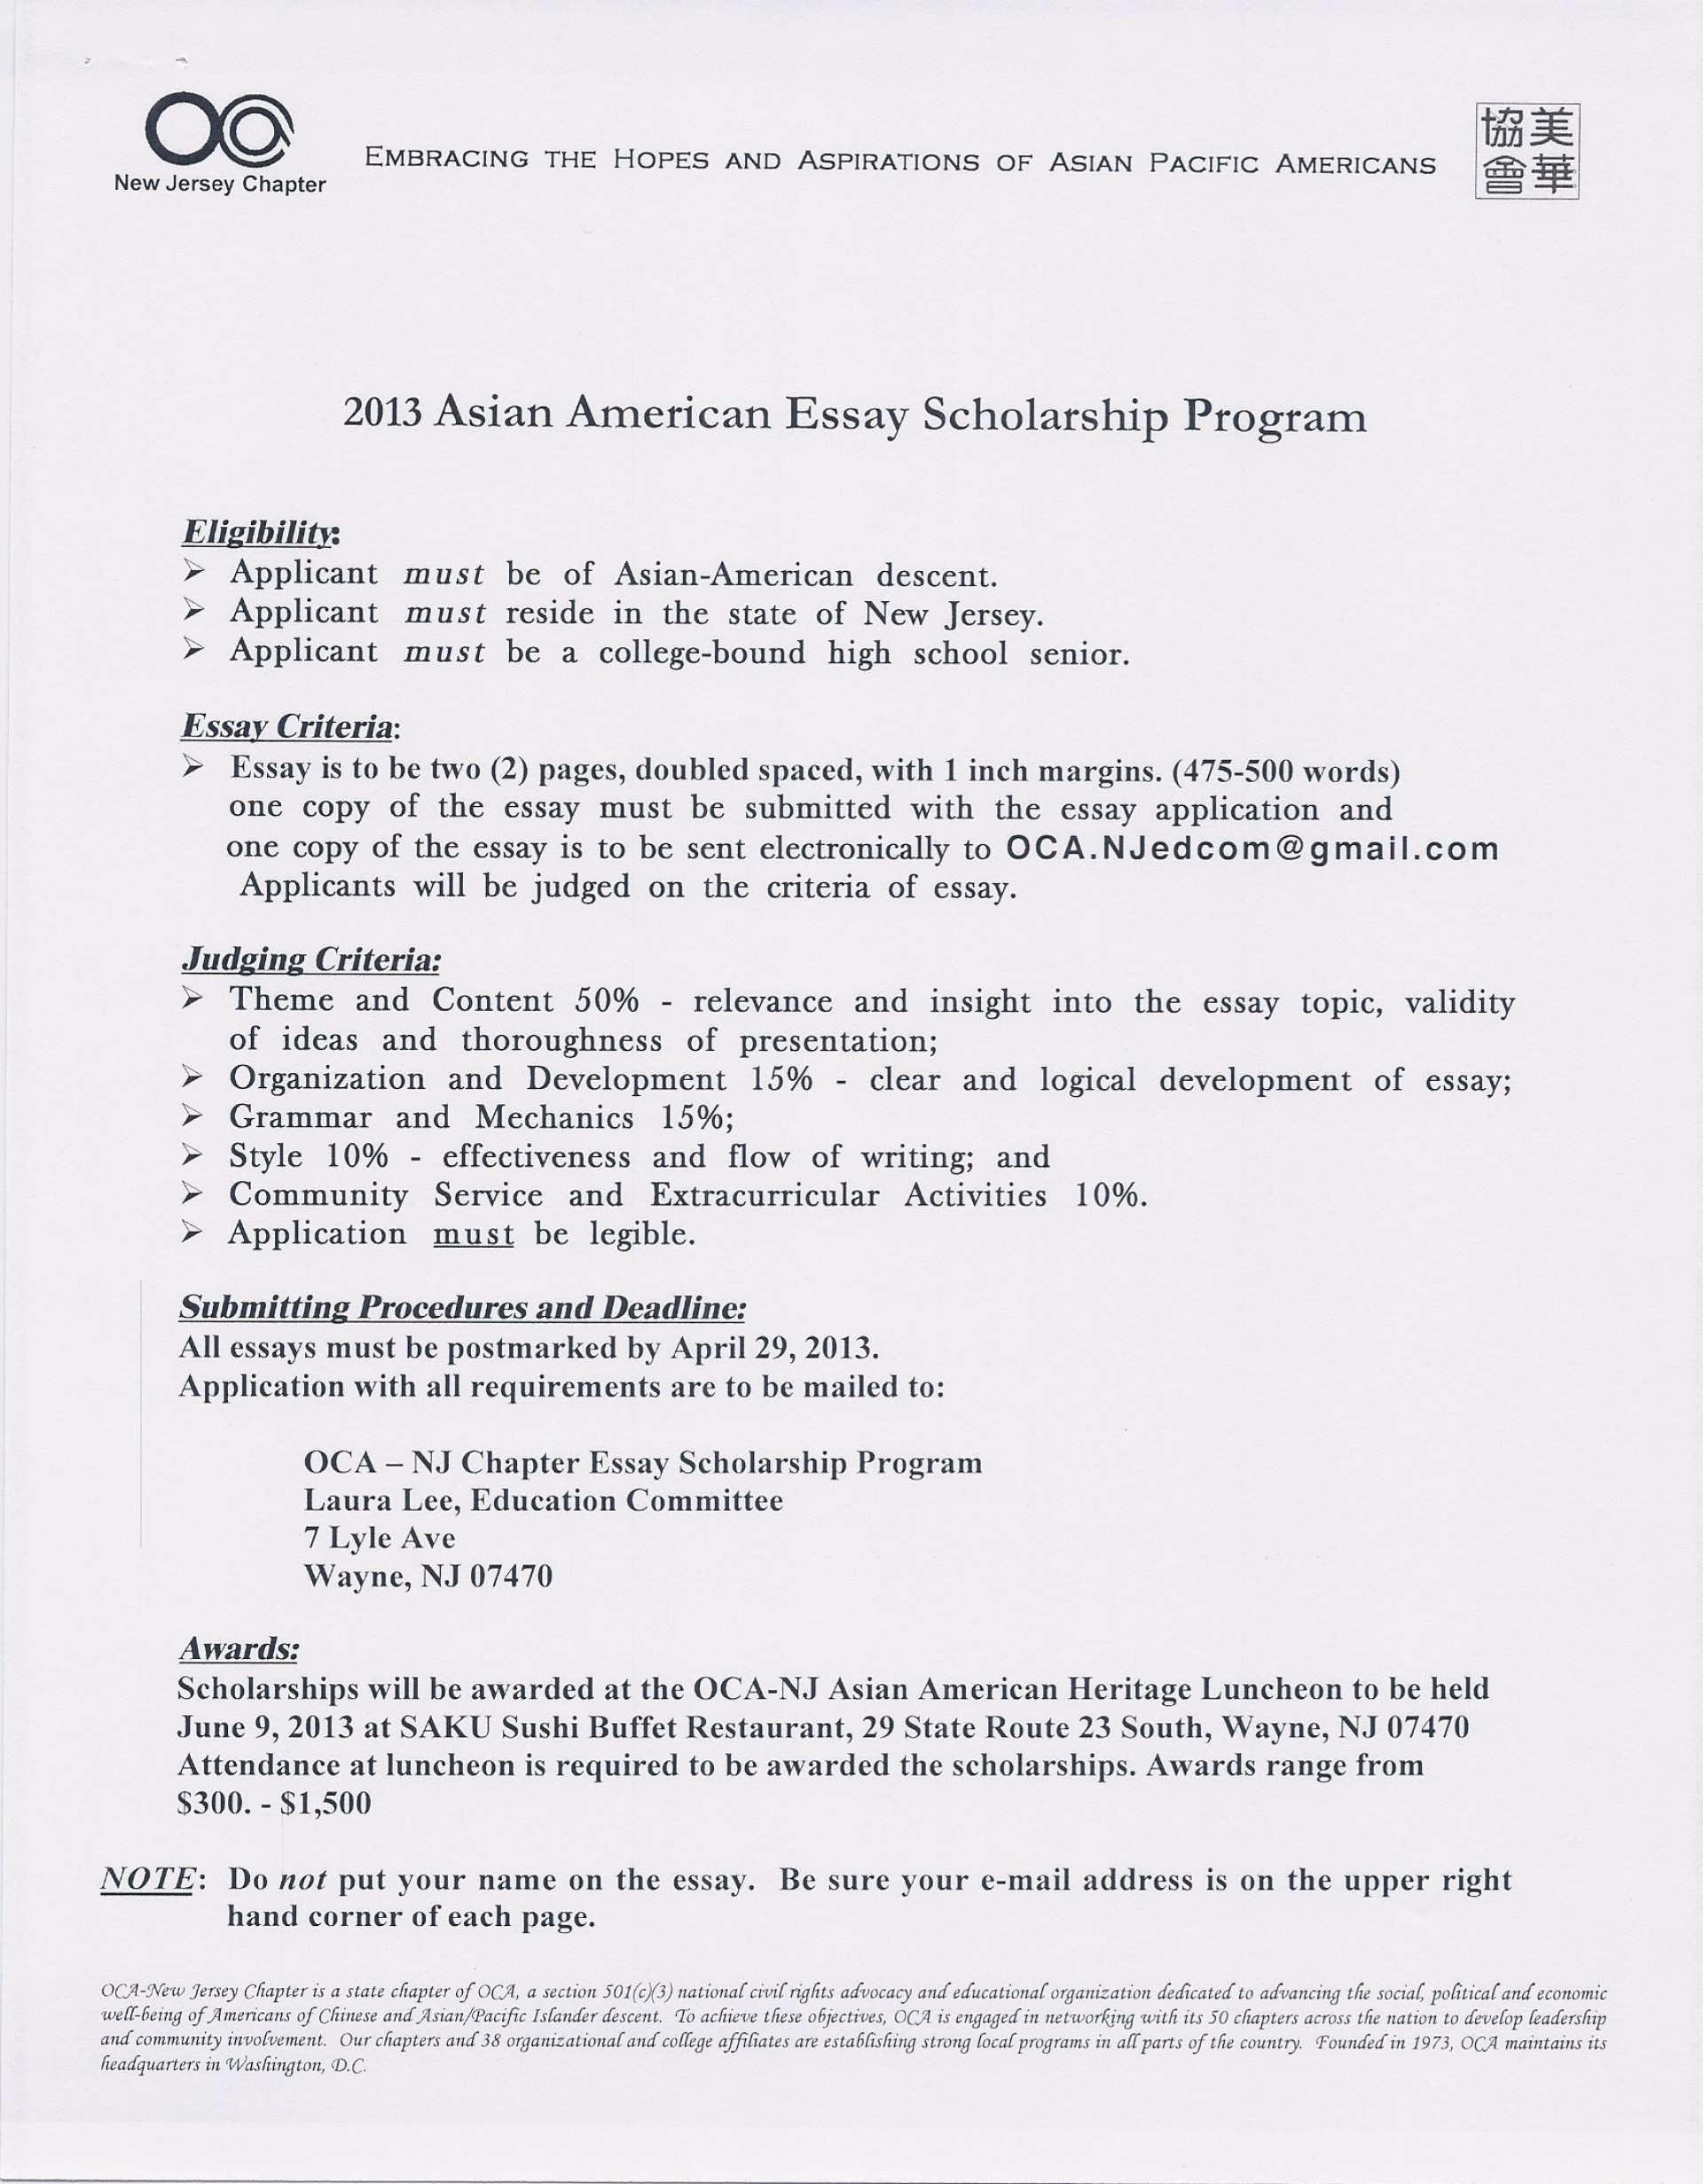 015 Essay Example Scholarship Tips Singular Rotc Psc Reddit 1920